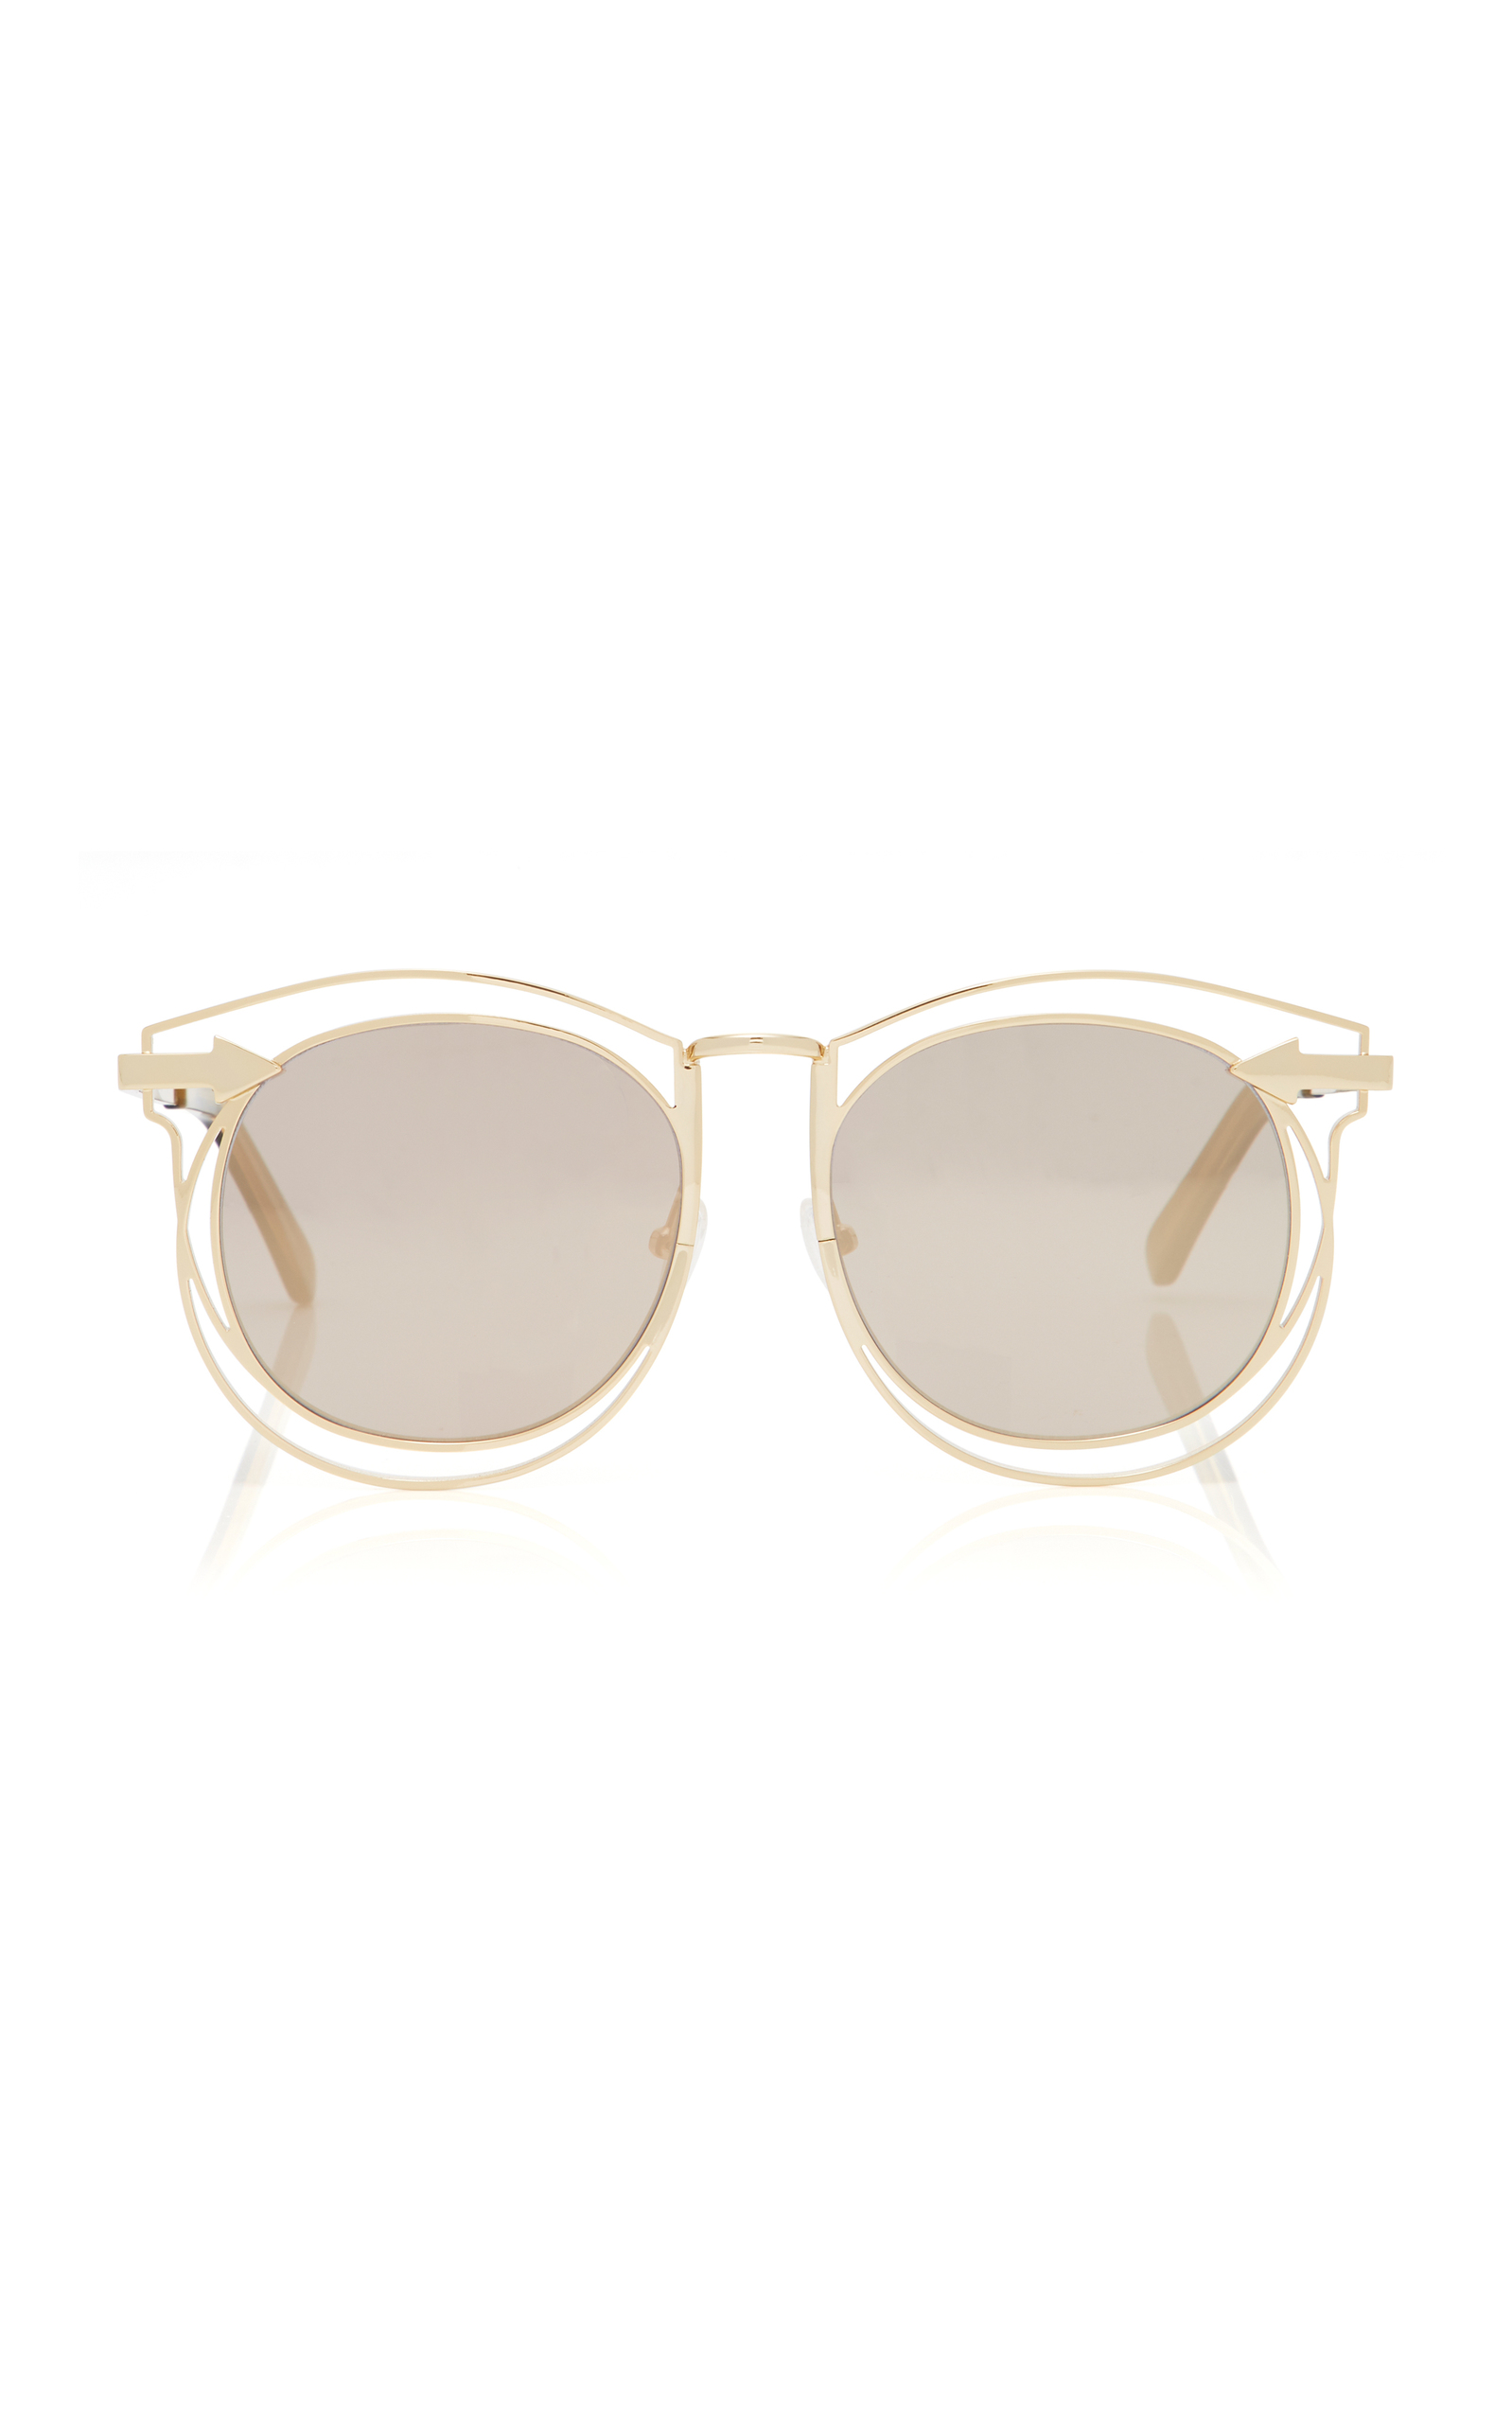 KAREN WALKER Superstar Simone Round-Frame Acetate Sunglasses, Gold ...